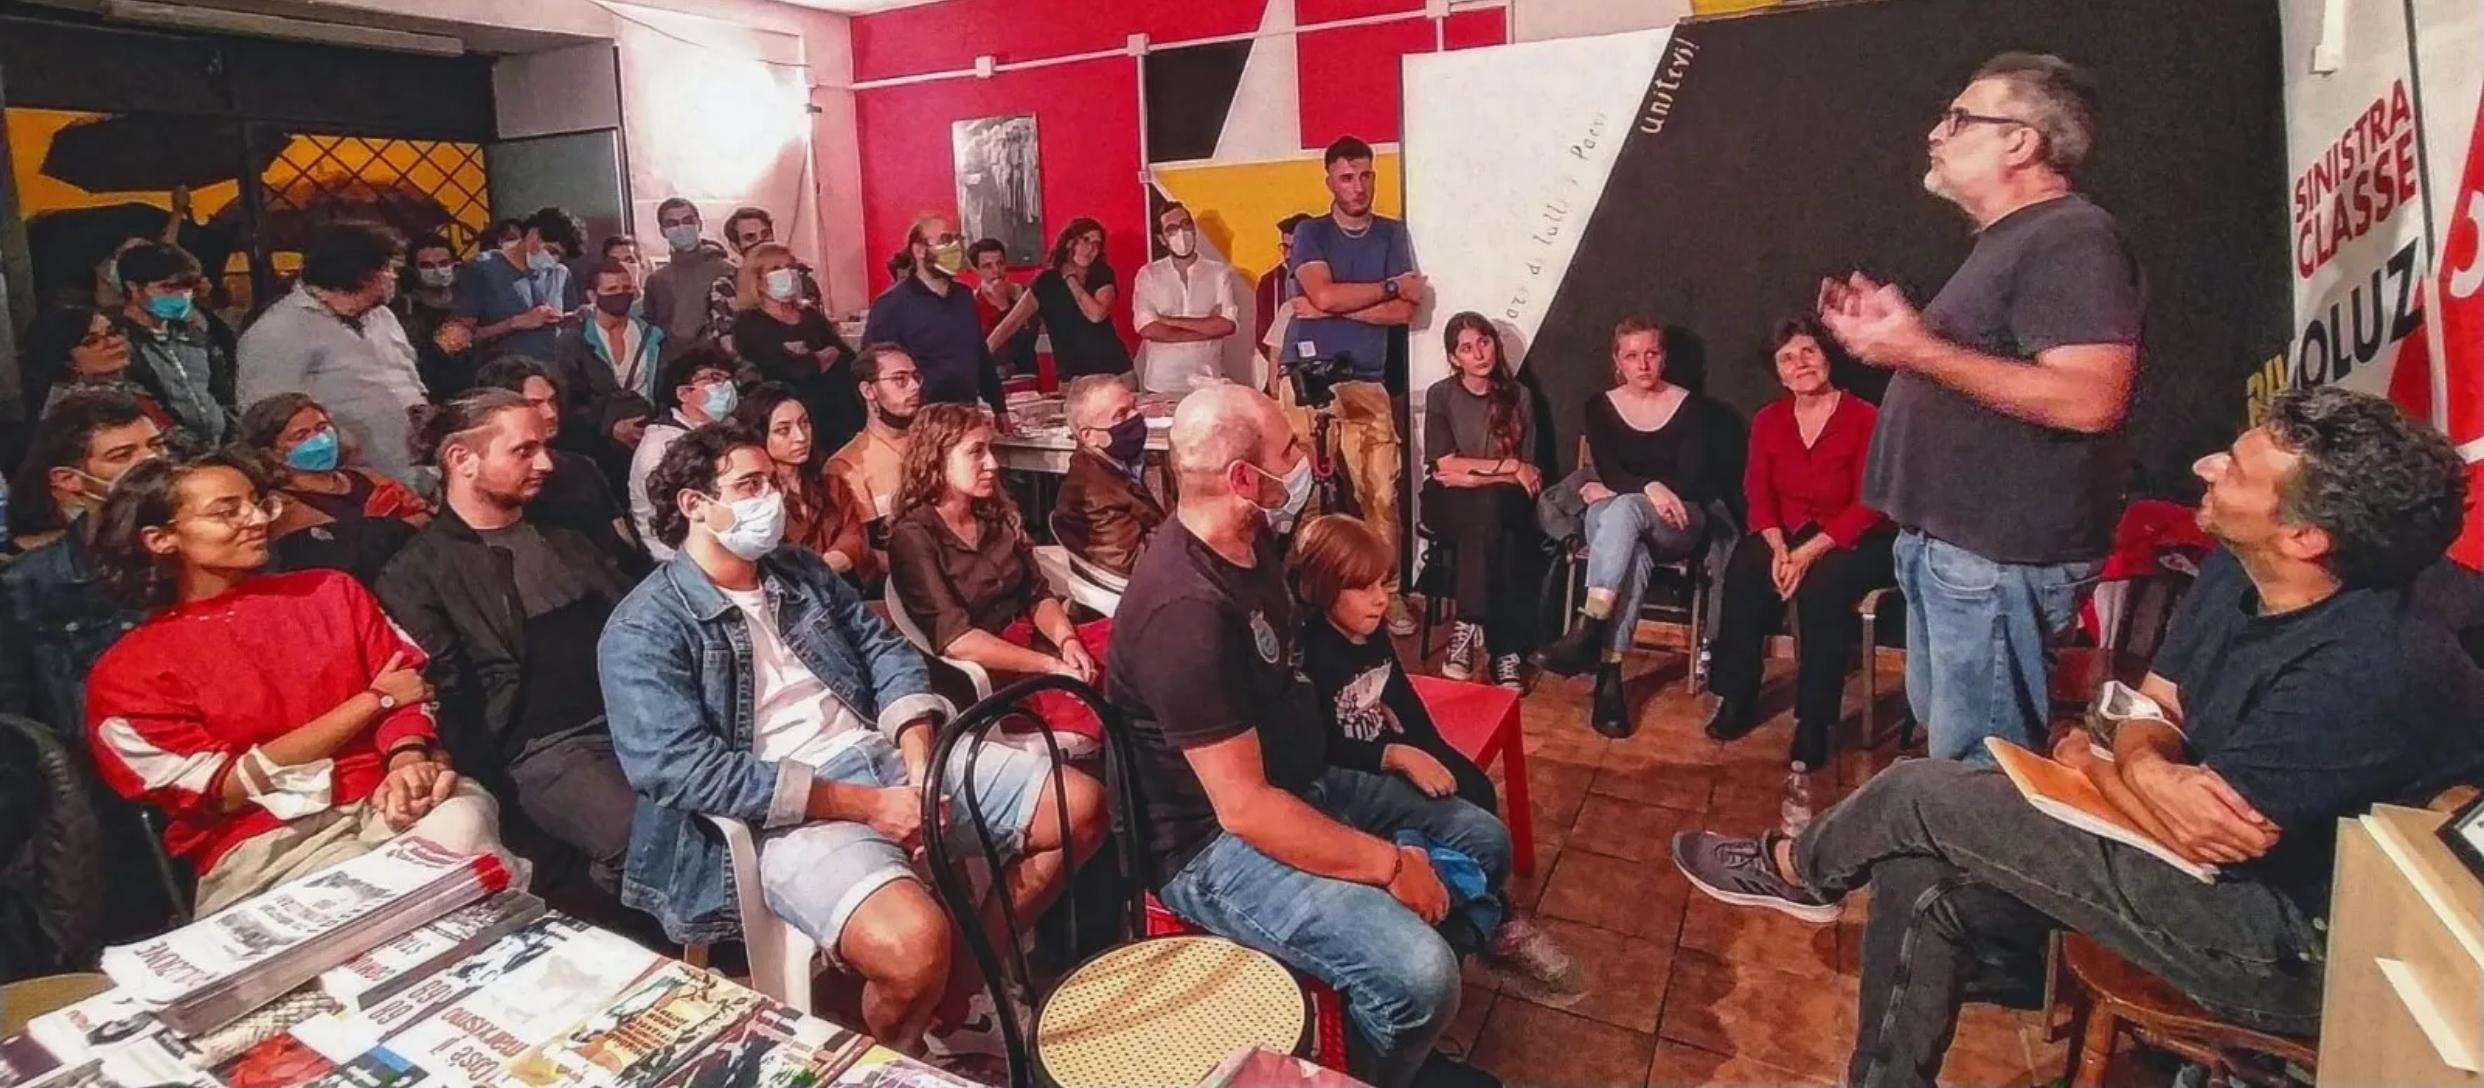 Alessandro speaking Image Sinistra Classe Rivoluzione